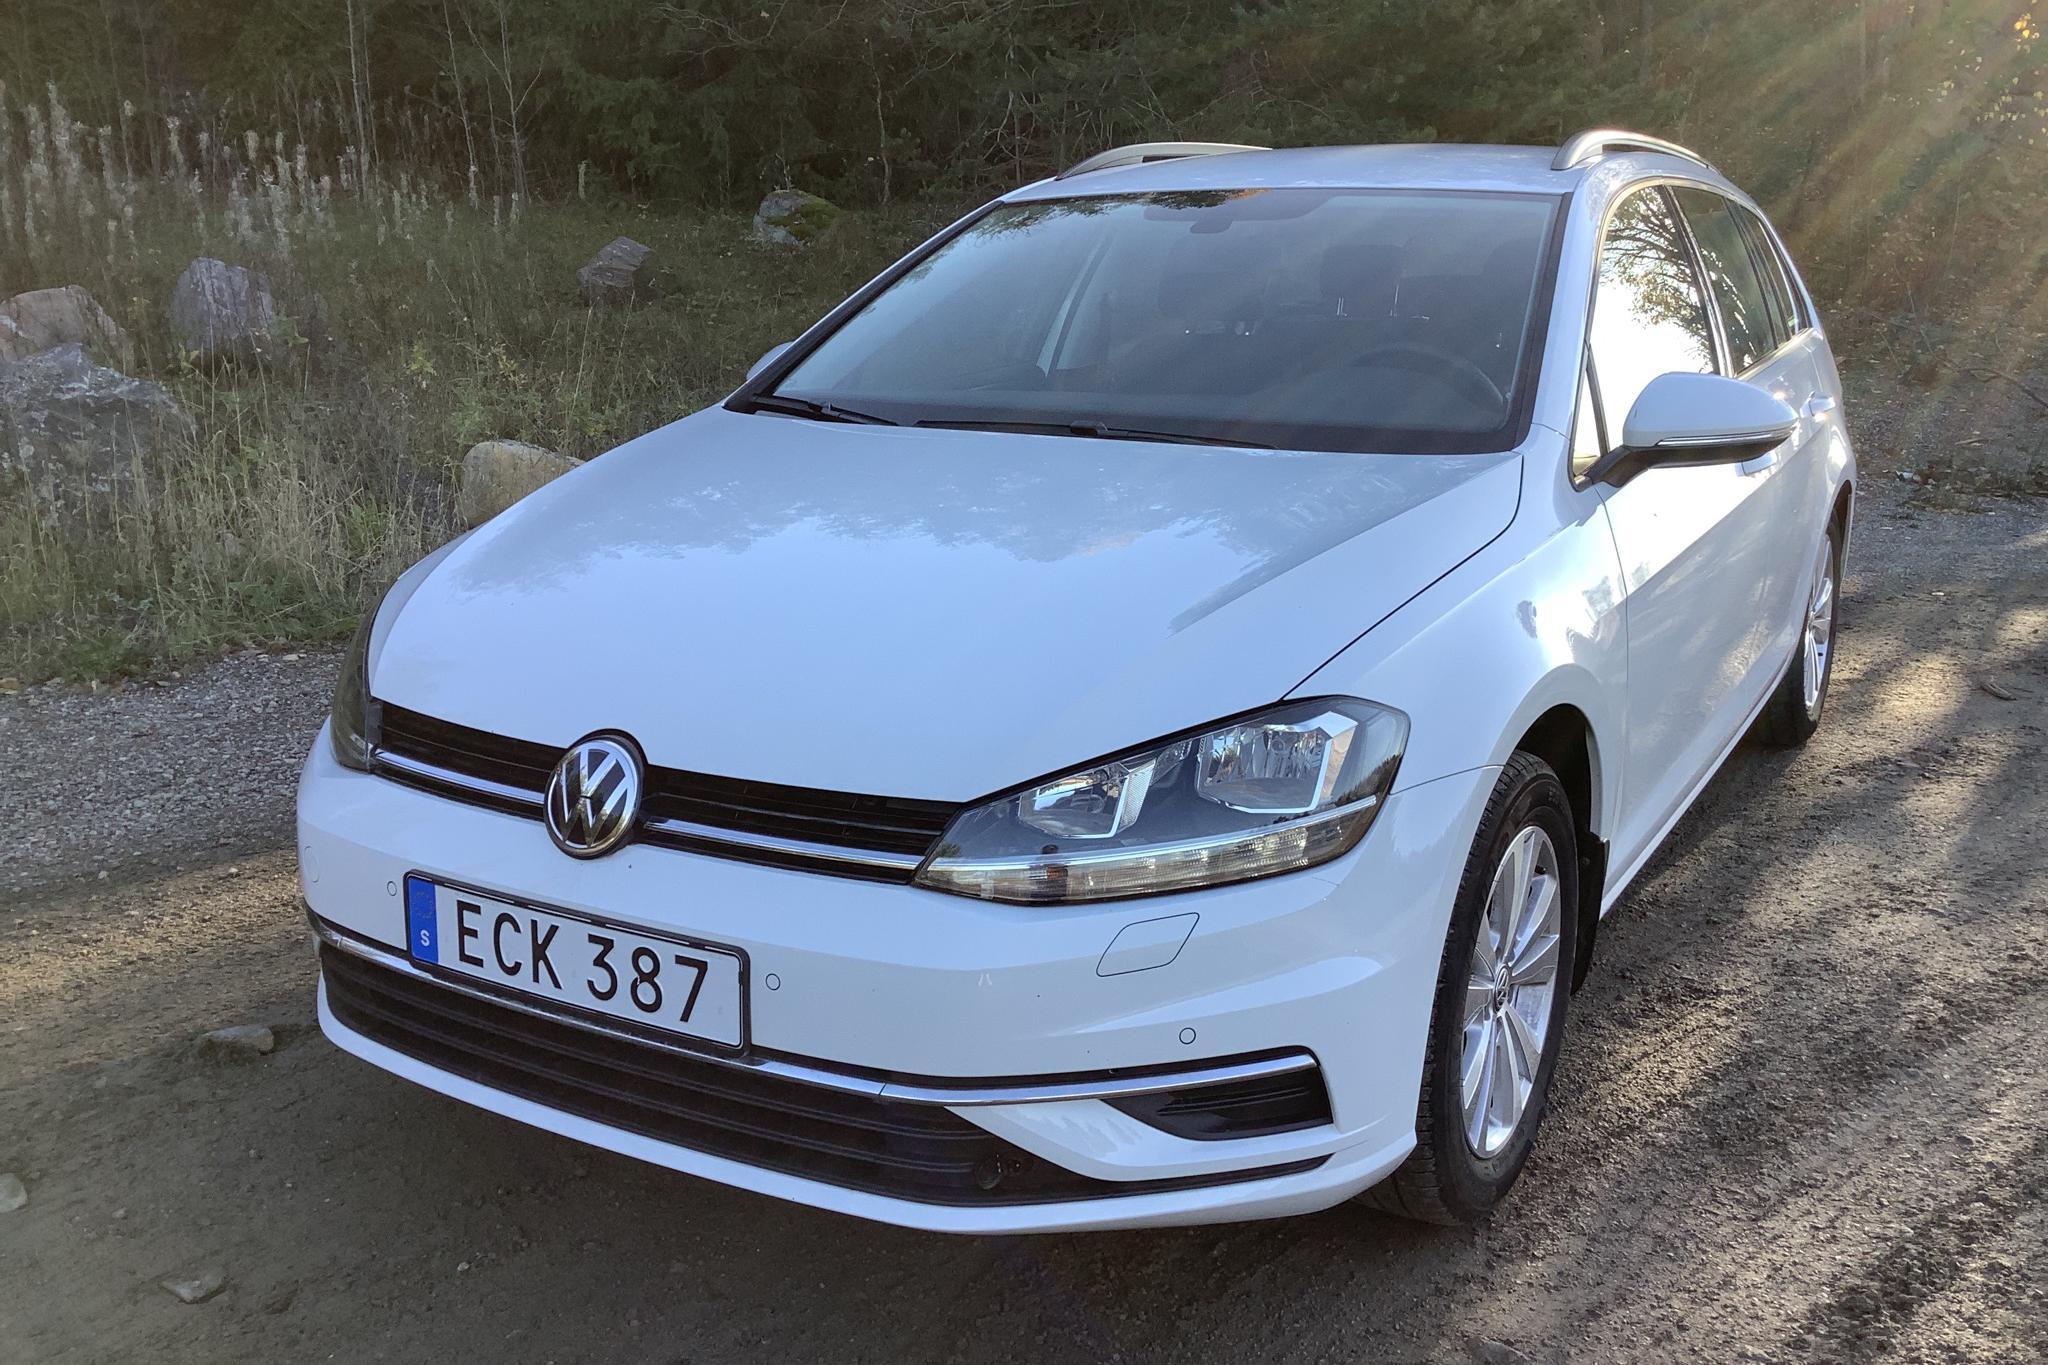 VW Golf VII 1.4 TSI Multifuel Sportscombi (125hk) - 13 680 km - Manual - white - 2018